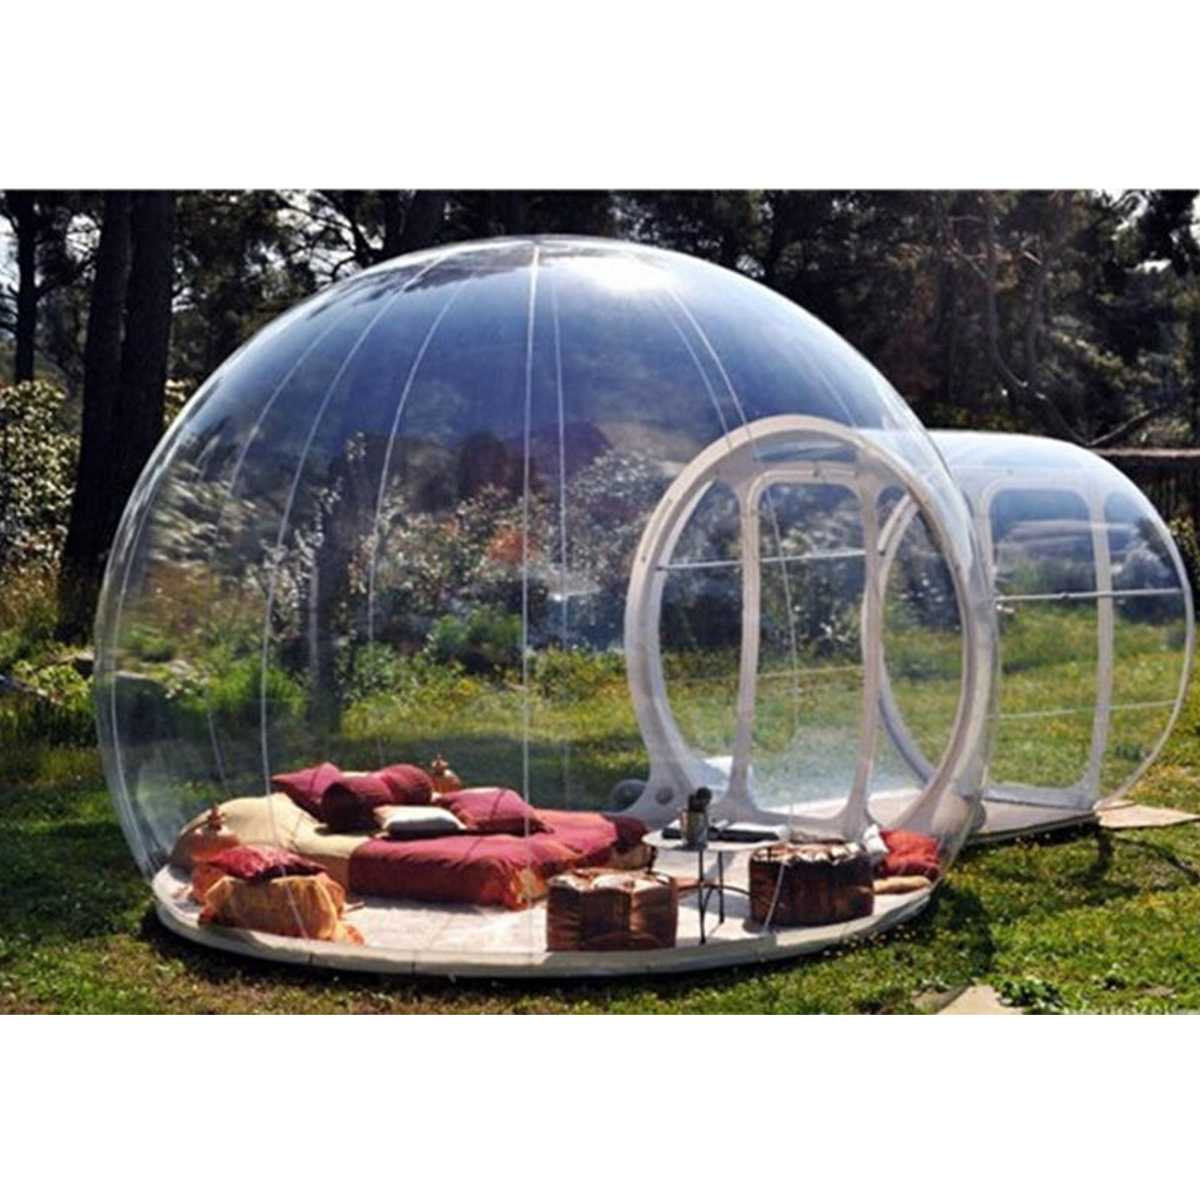 3/4/5 m 10/13/16ft Camping En Plein Air tente gonflable bubble Grand bricolage Maison Dôme Camping Cabine lodge Air Bulle tente transparente